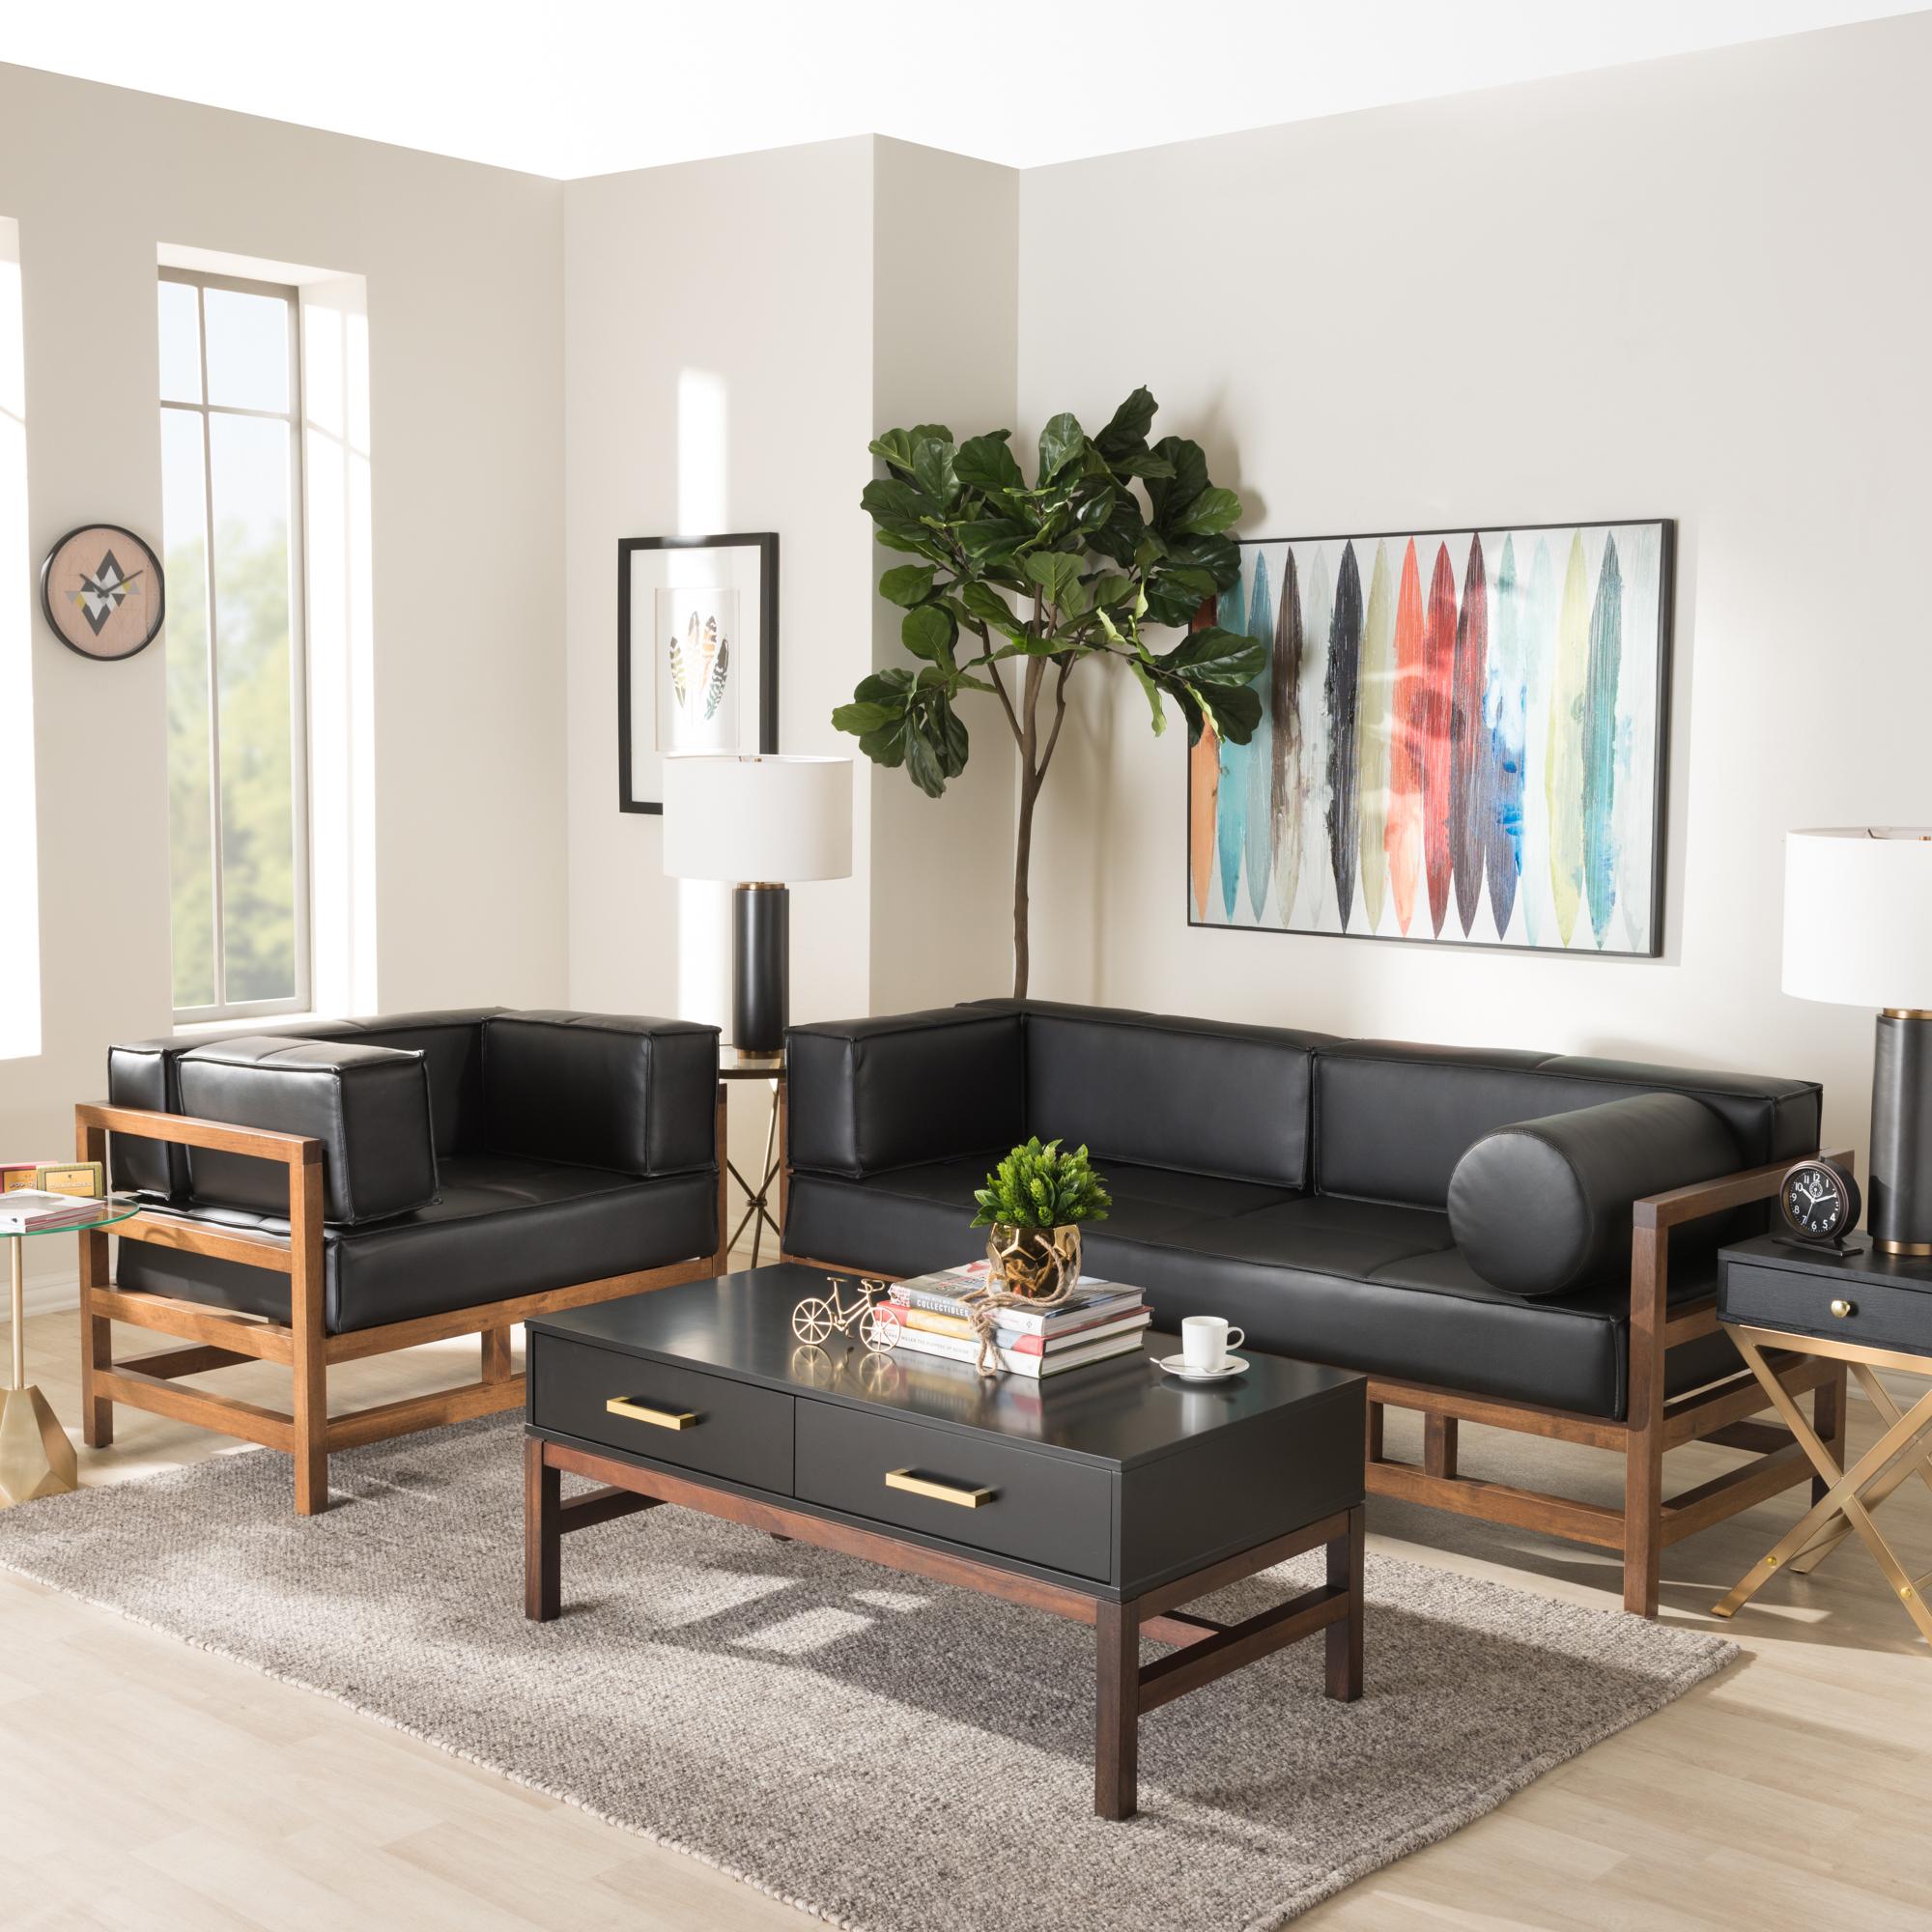 Pine Living Room Furniture Sets 2 kitchen cabinet sliving room list of things